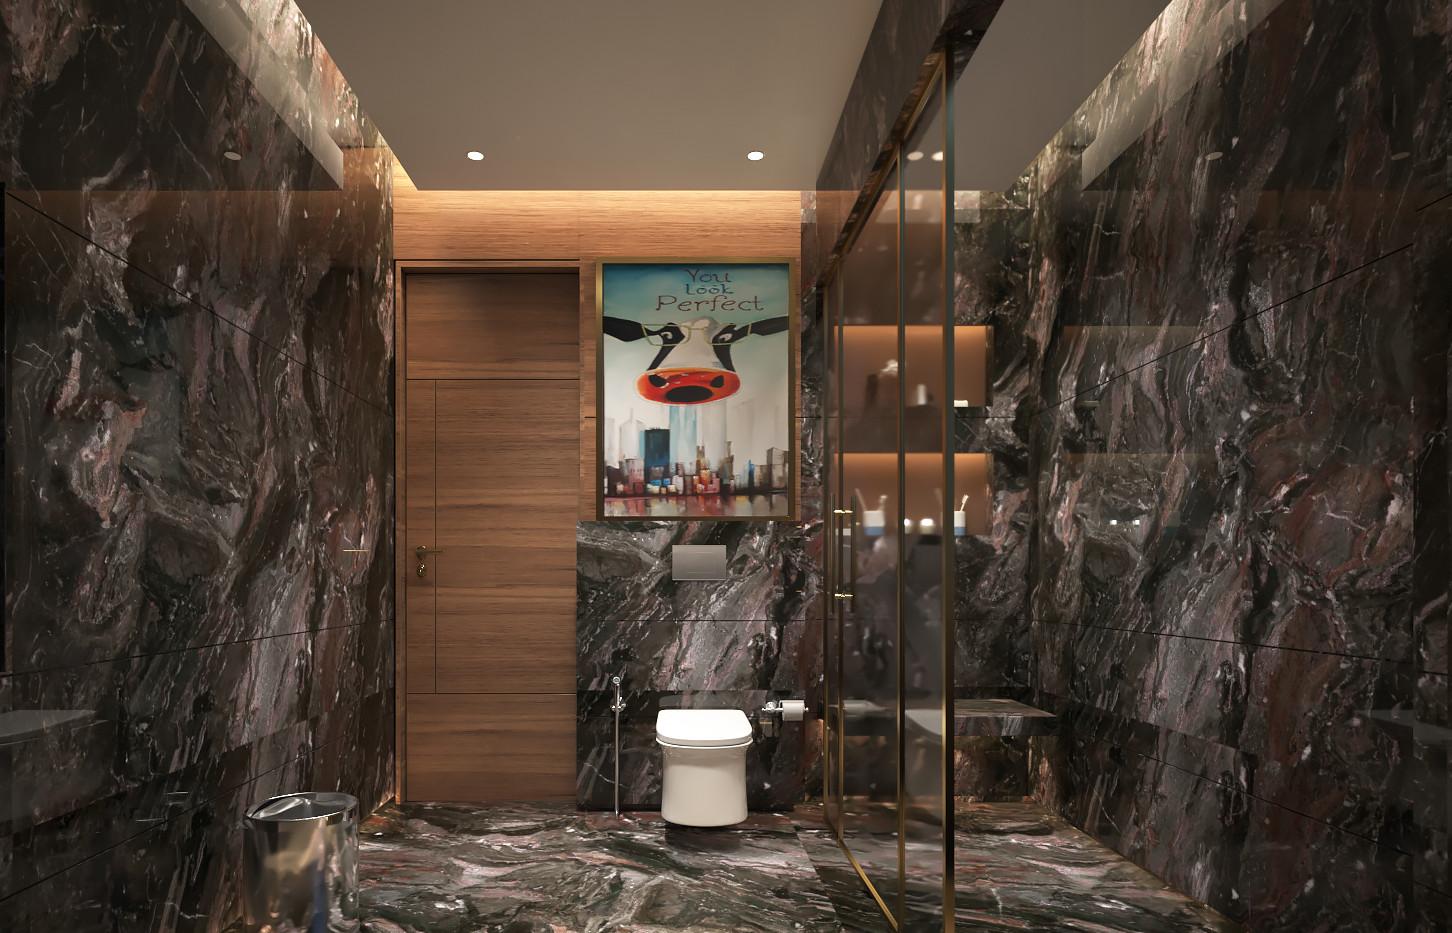 Toilet cam 14.jpg